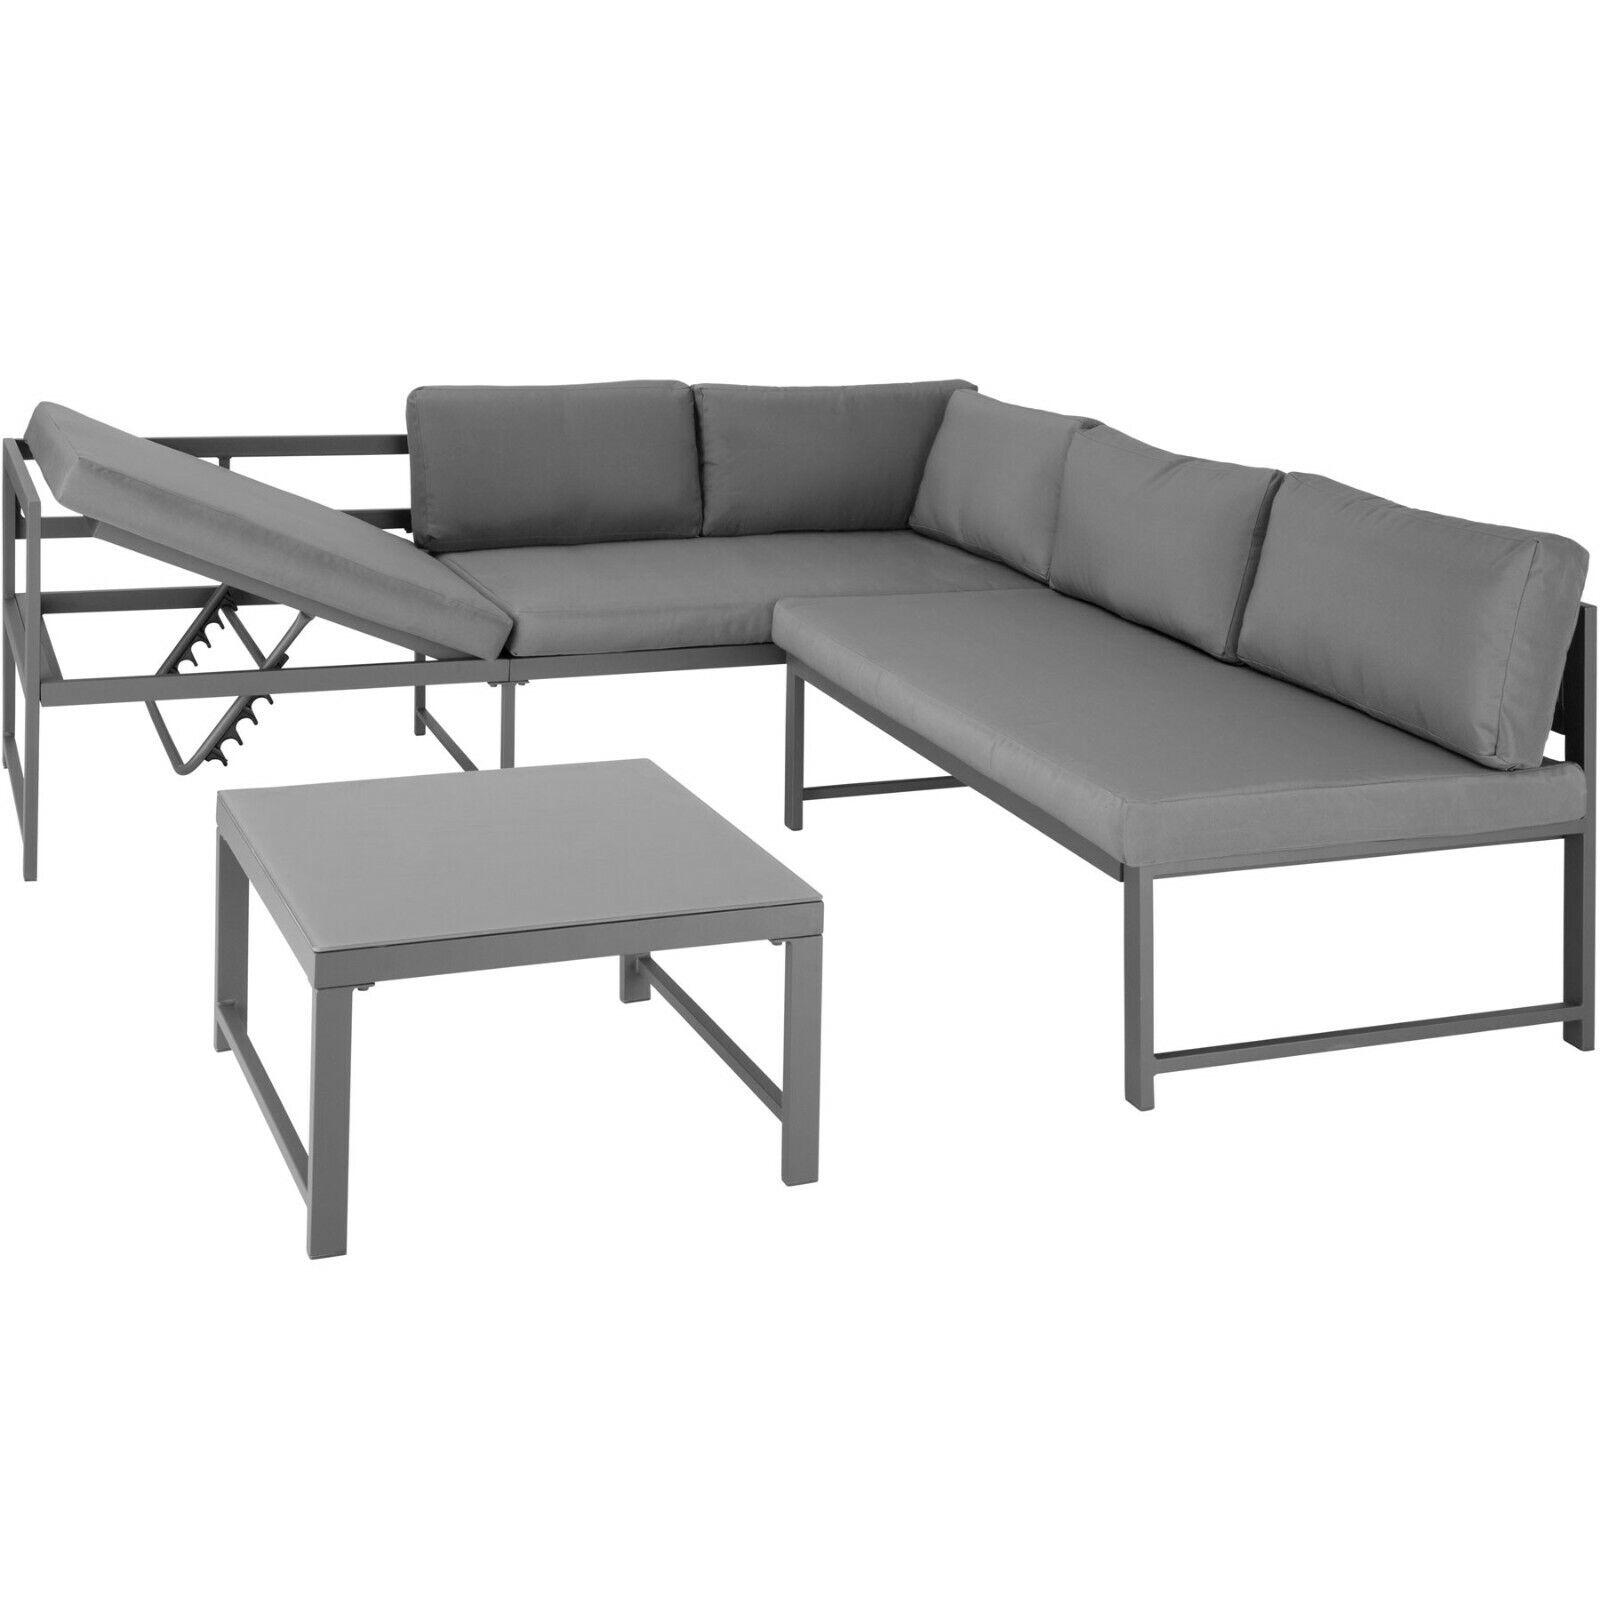 Aluminium Sitzgruppe Set Sofa Couch Lounge Gartenmöbel Garnitur Grau BWare